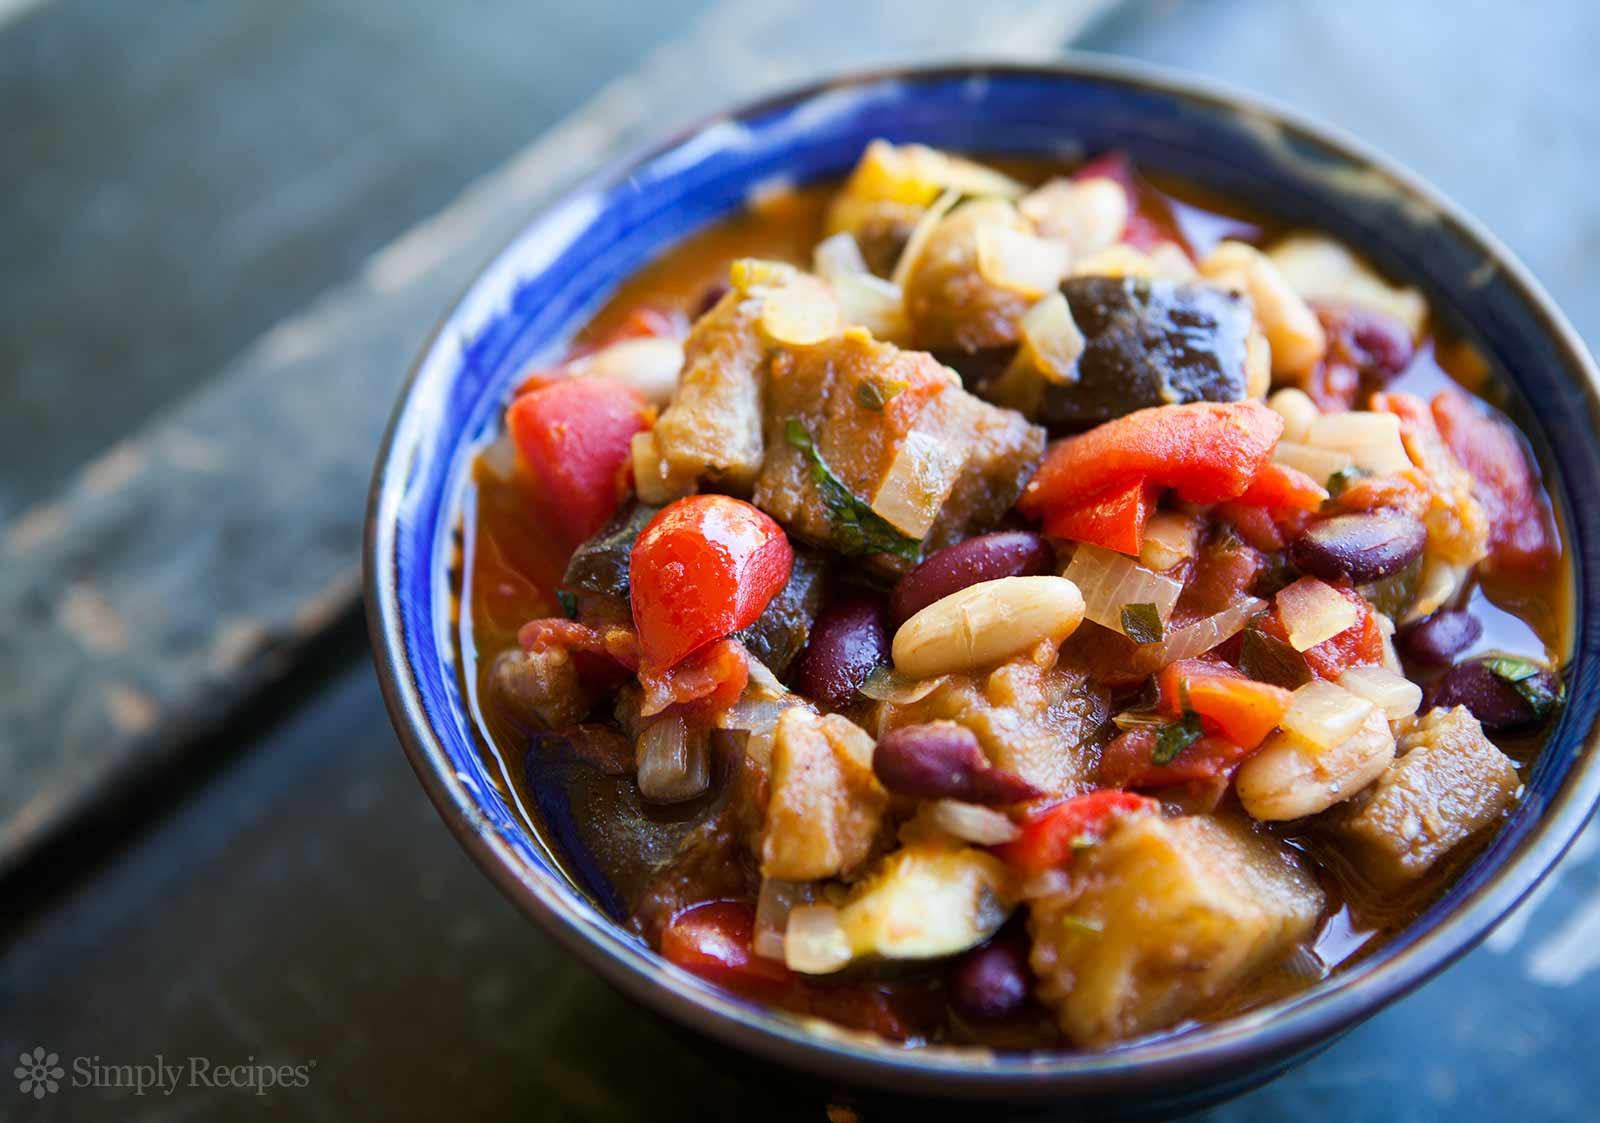 Vegetarian Chili Allrecipes  Spicy Ve arian Chili Recipe